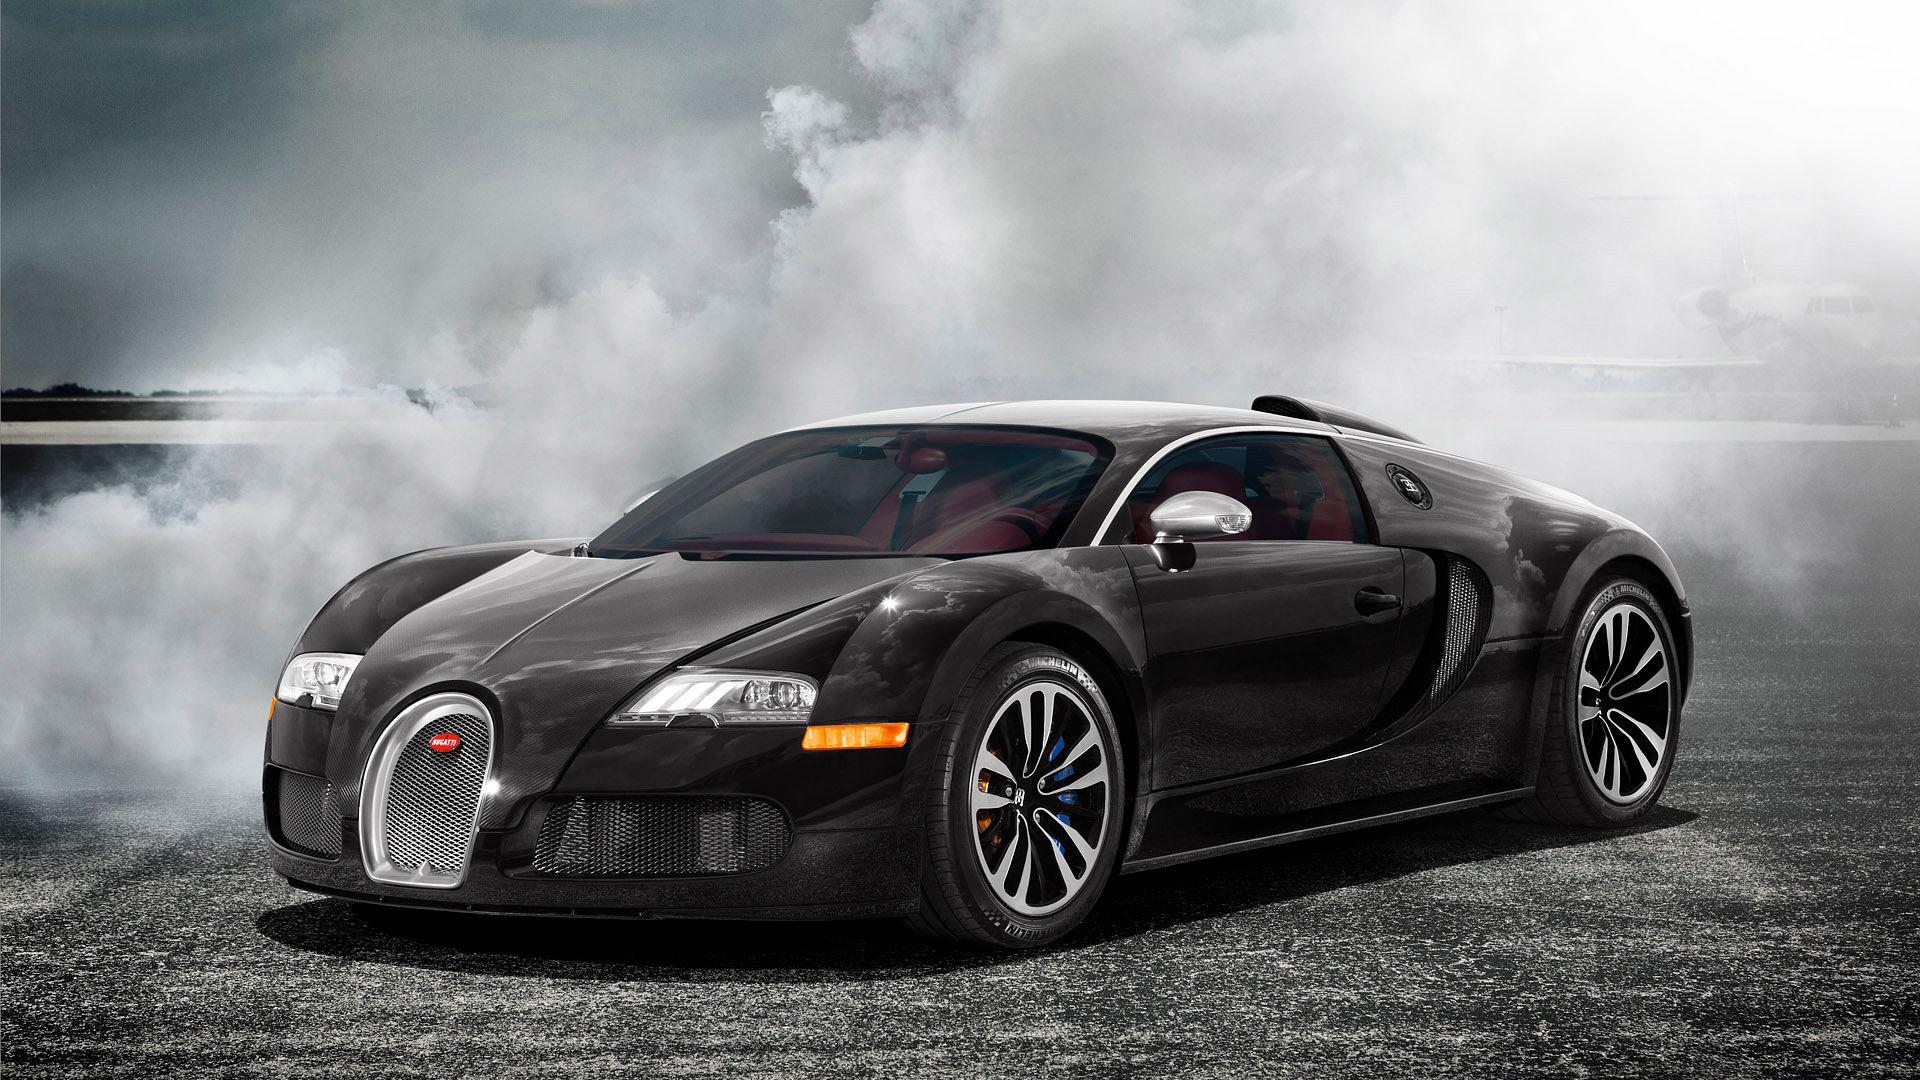 Veyron 2013 Sports Cars HD Wallpaper Bugatti Veyron 2013 Sports Cars 1920x1080